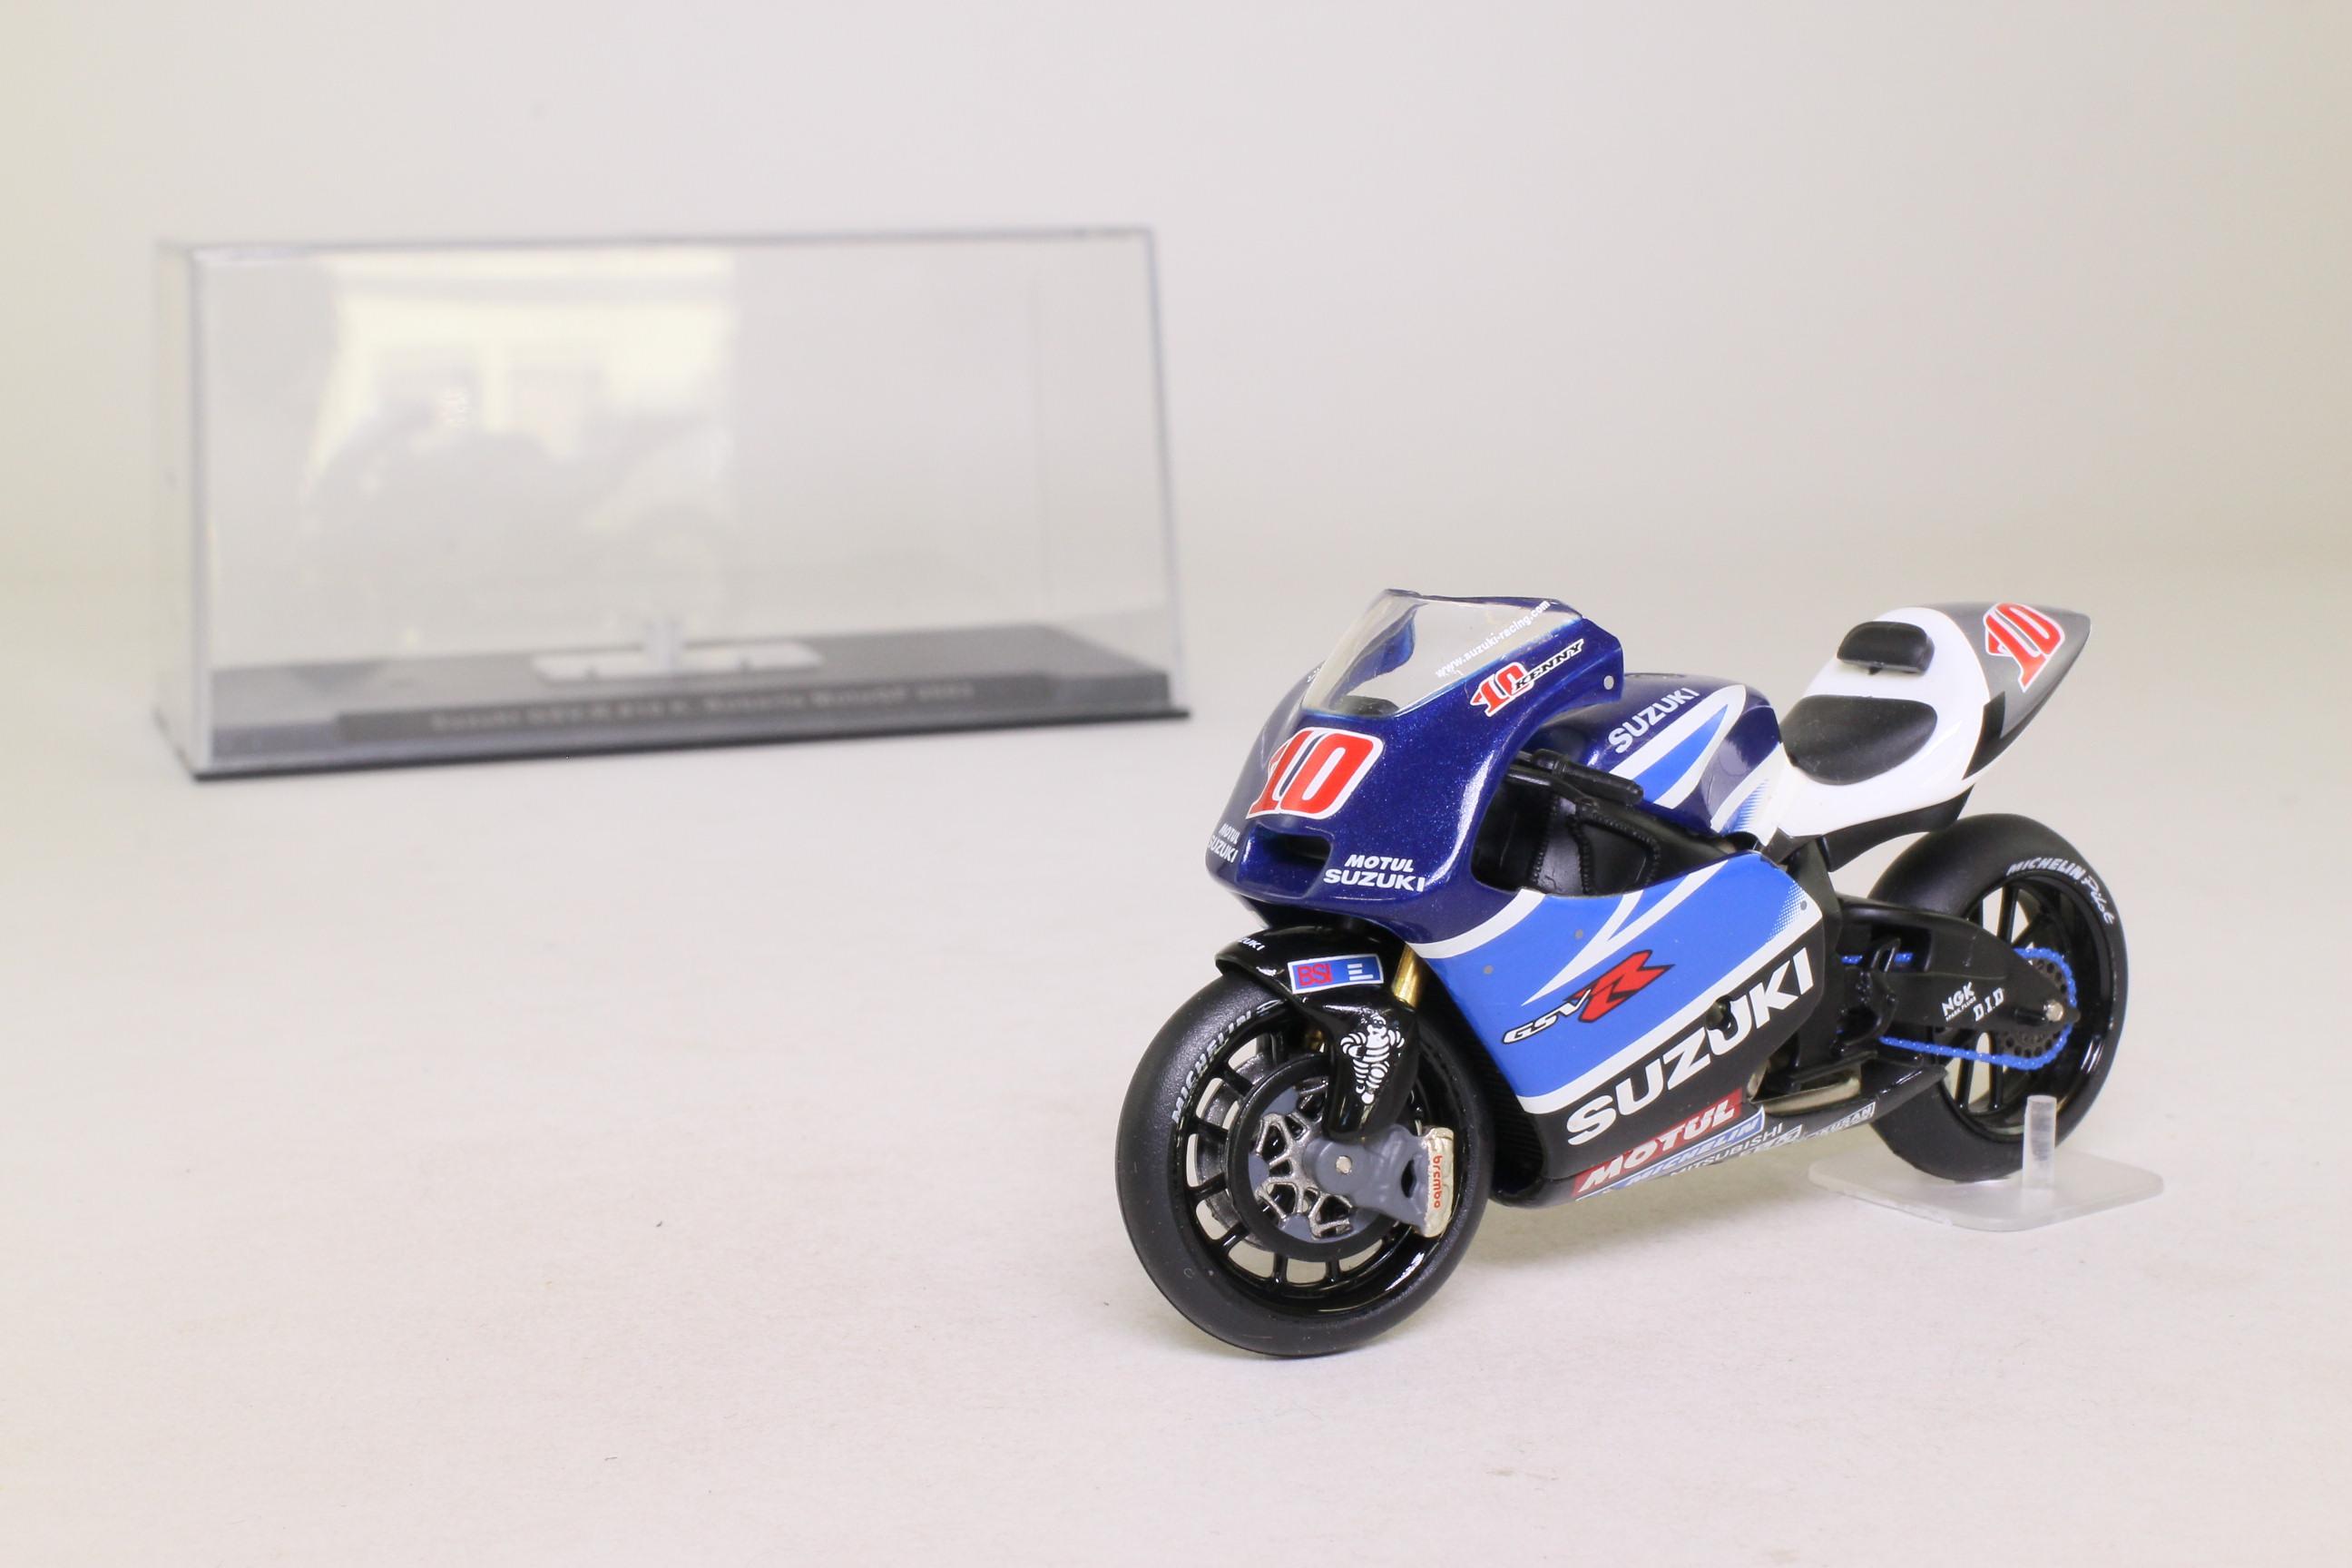 ... IXO; Suzuki GSV R Moto GP Motorcycle; 2003, K Roberts, RN10